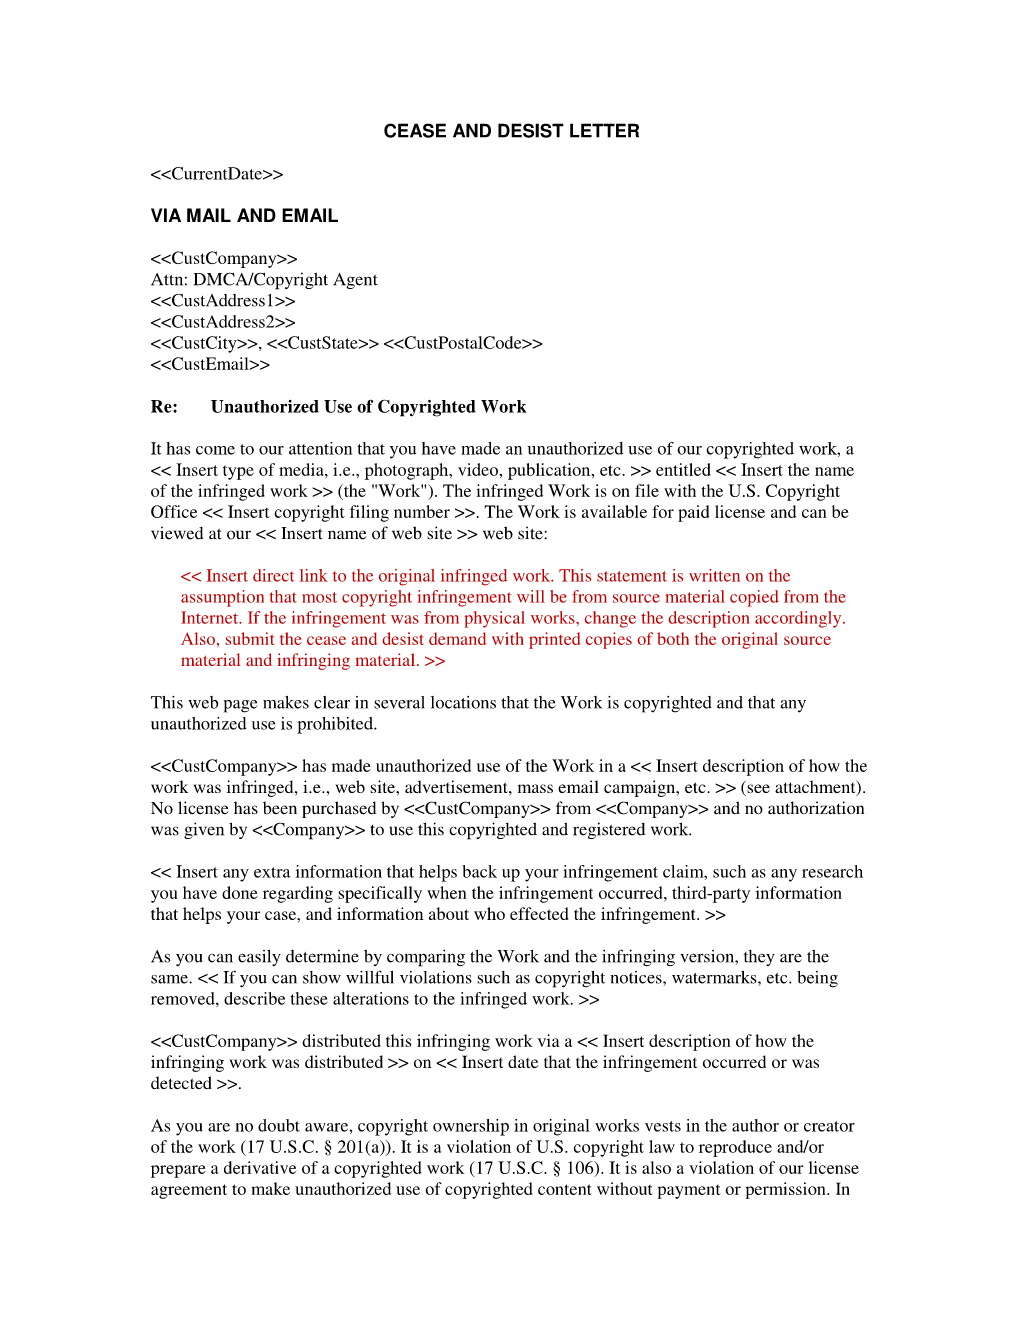 Patent Infringement Letter Template - 20 Best Trademark Infringement Letter Template Uk Pics